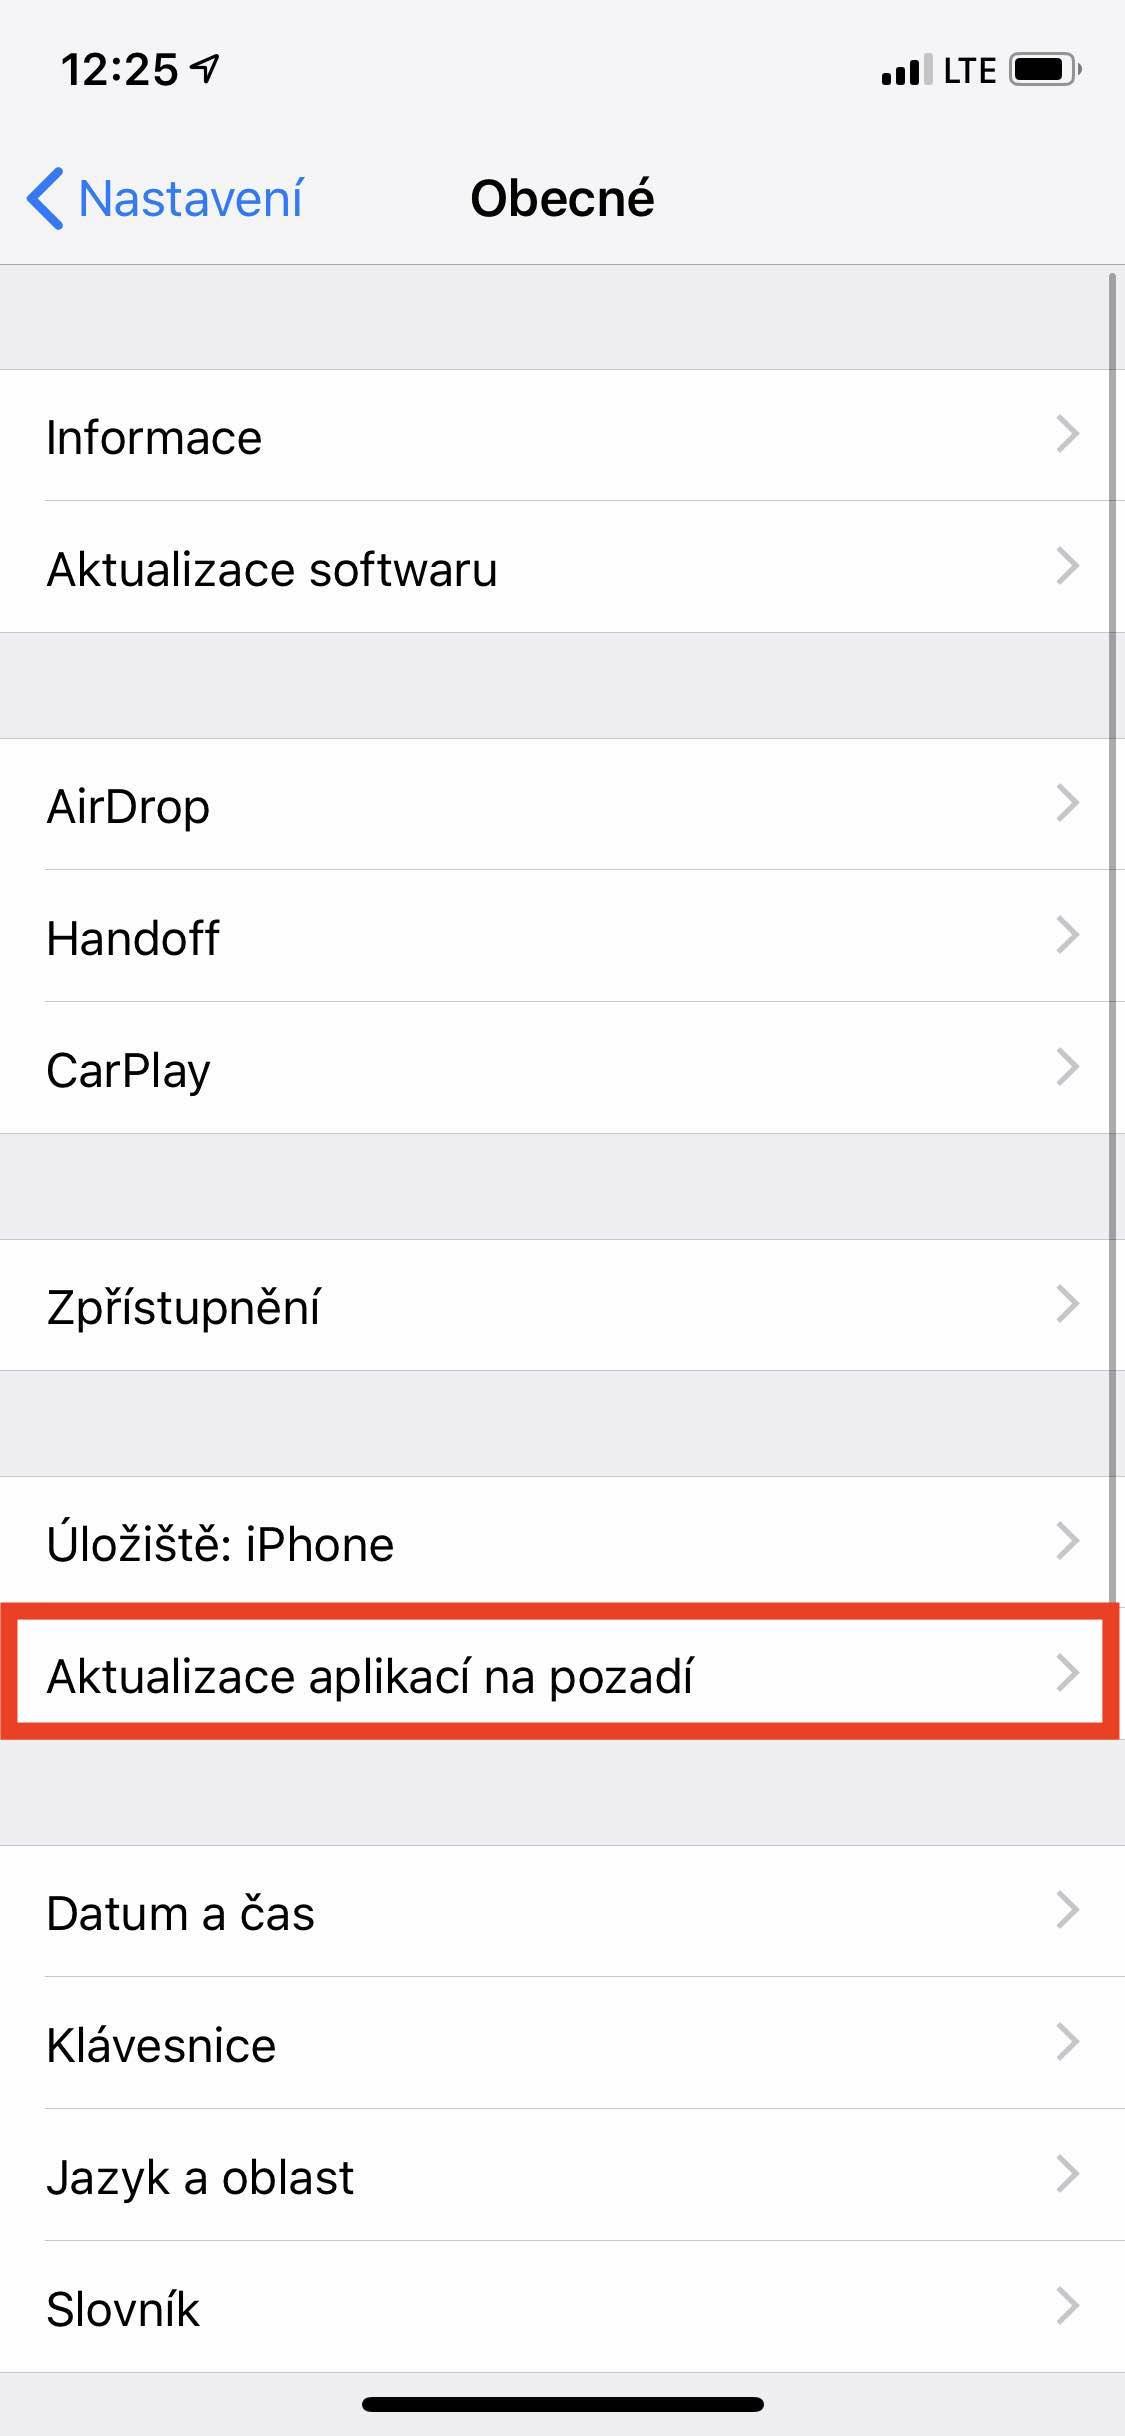 aktualizace_na_pozadi2